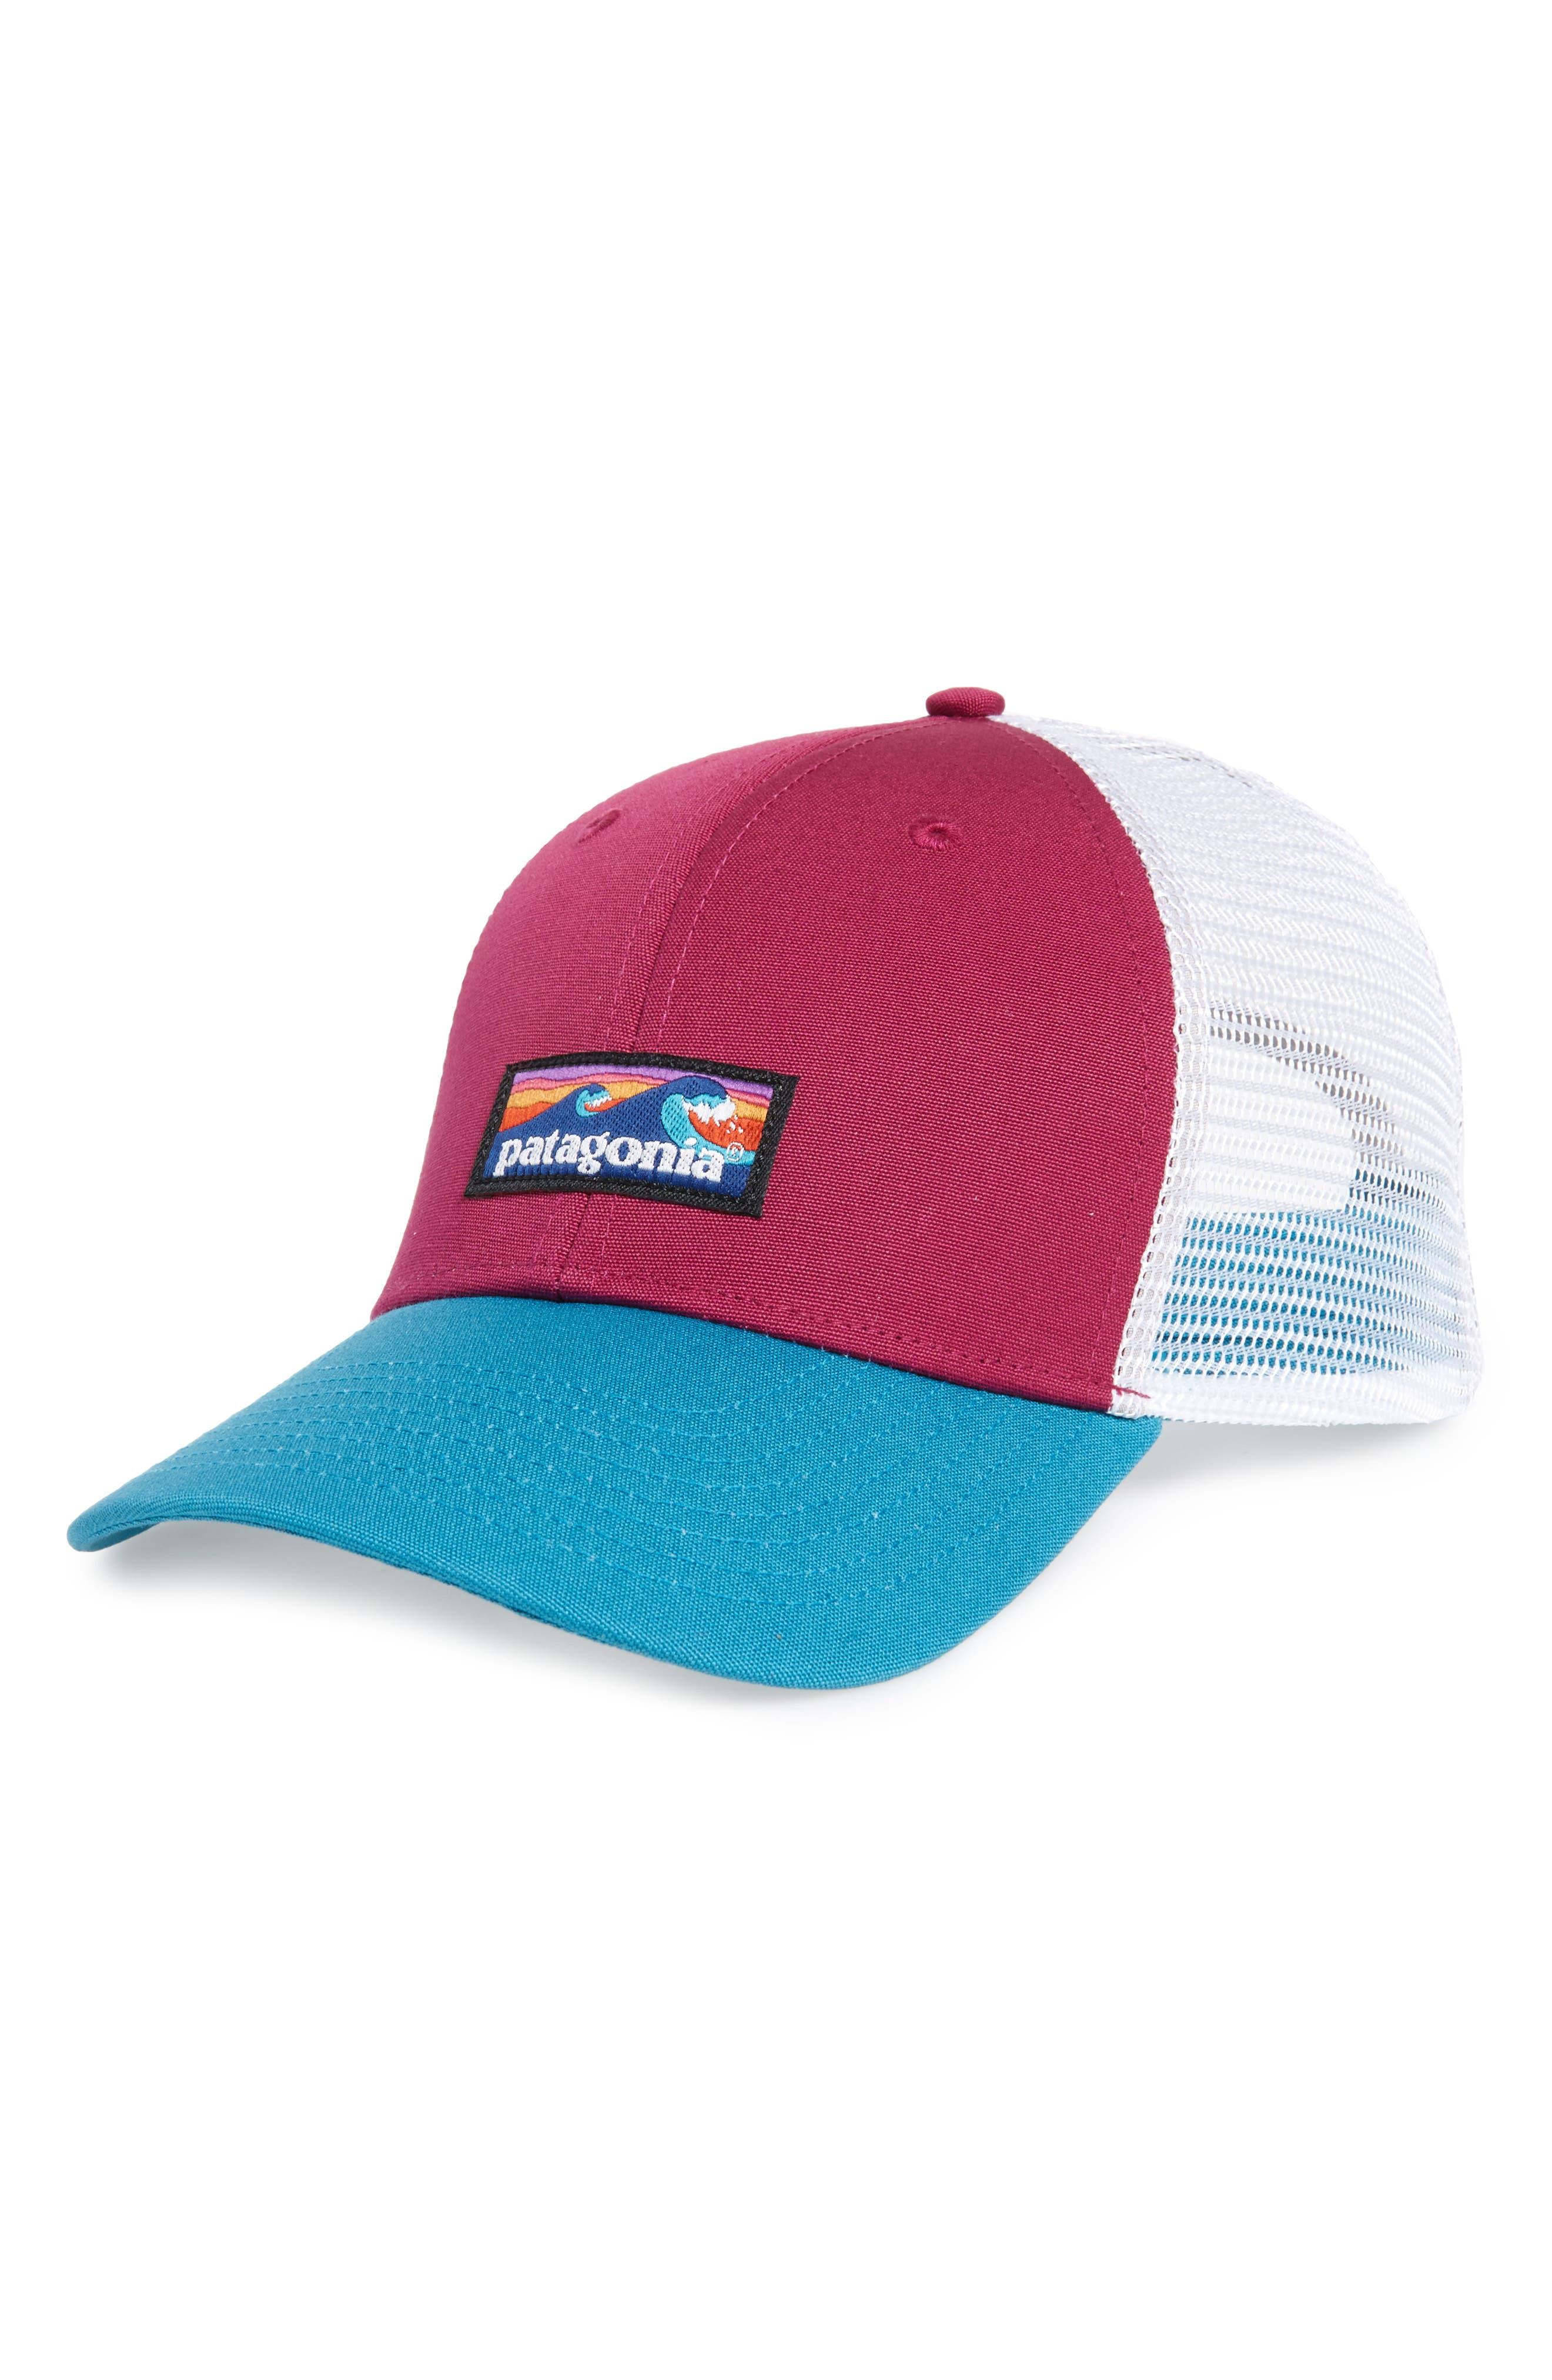 Patagonia Board Short Trucker Hat